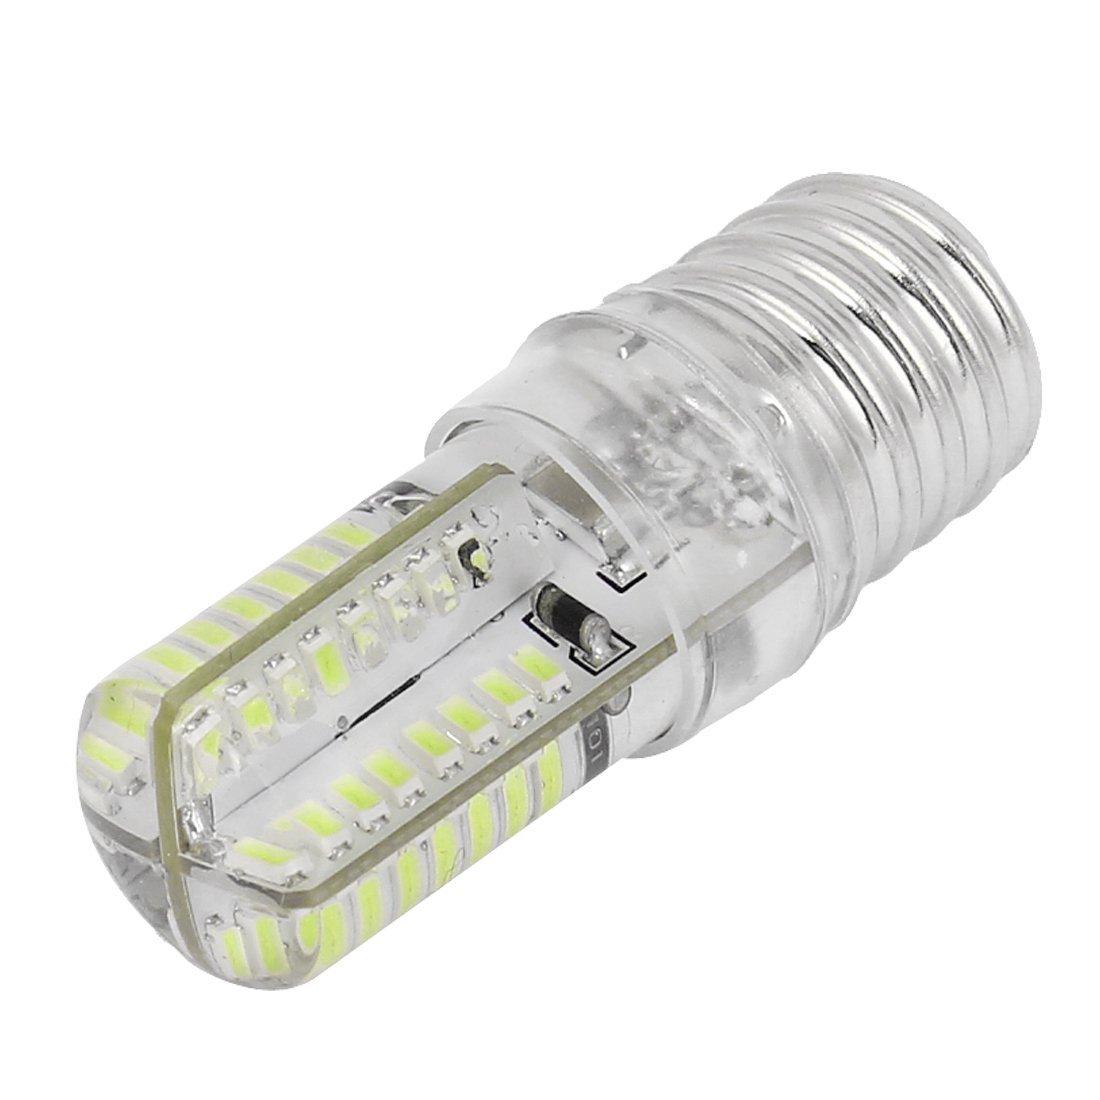 E17 Socket 5W 64 LED Lamp Bulb 3014 SMD Light Pure White AC 110V-220V